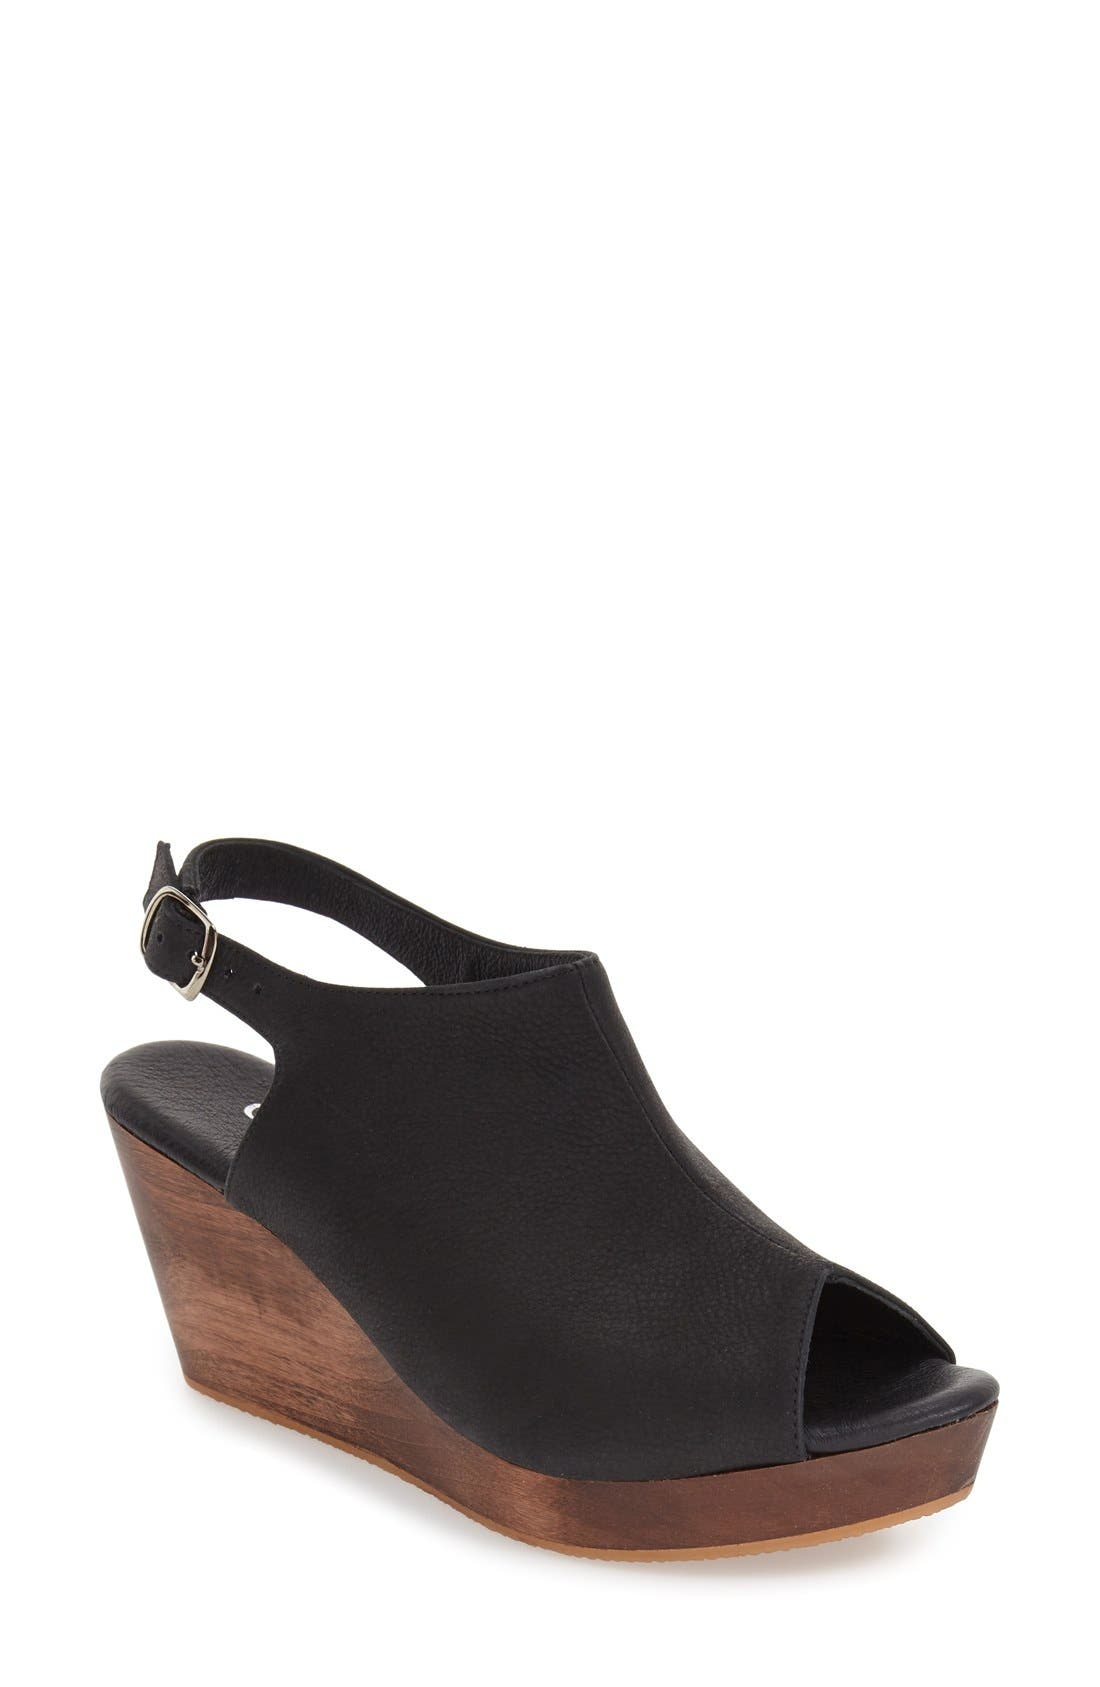 Main Image - Cordani 'Fellesley' Slingback Wedge Sandal ...